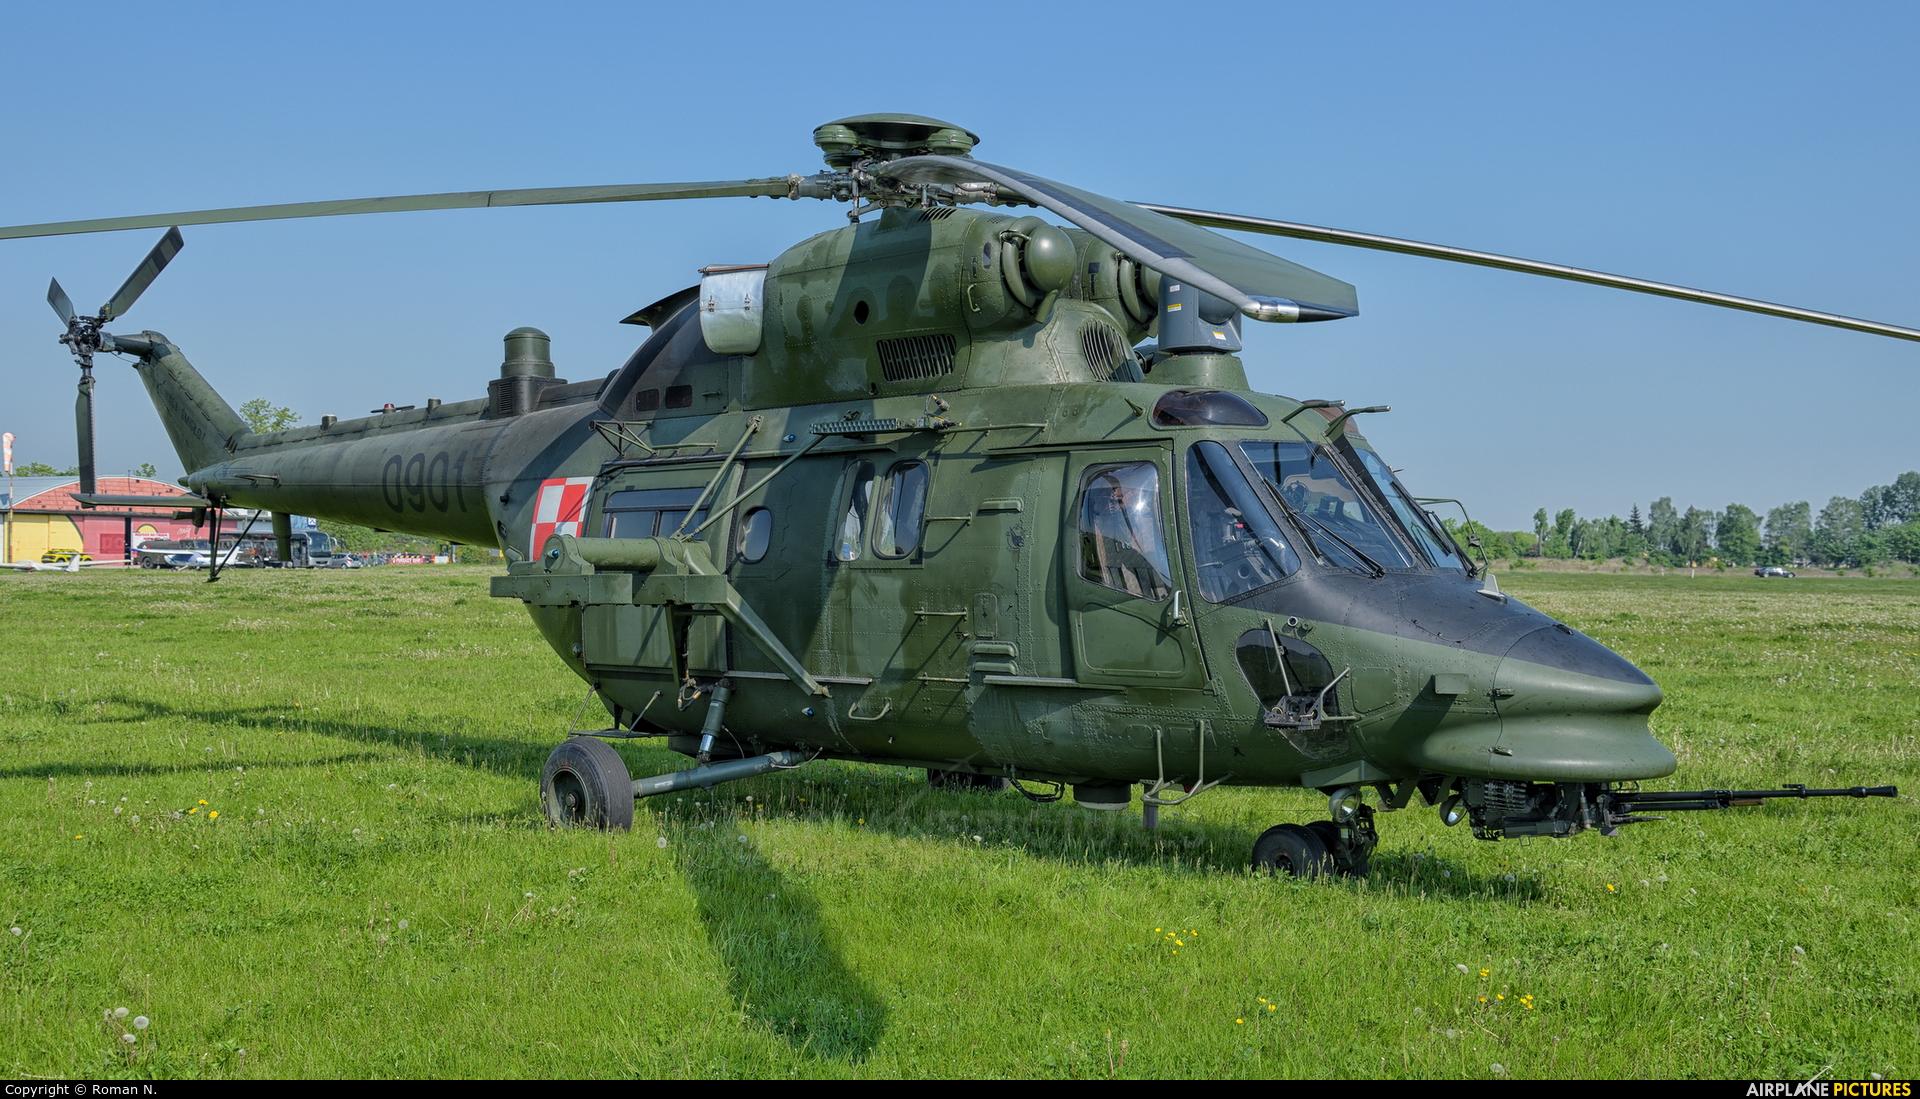 Poland - Army 0901 aircraft at Inowrocław